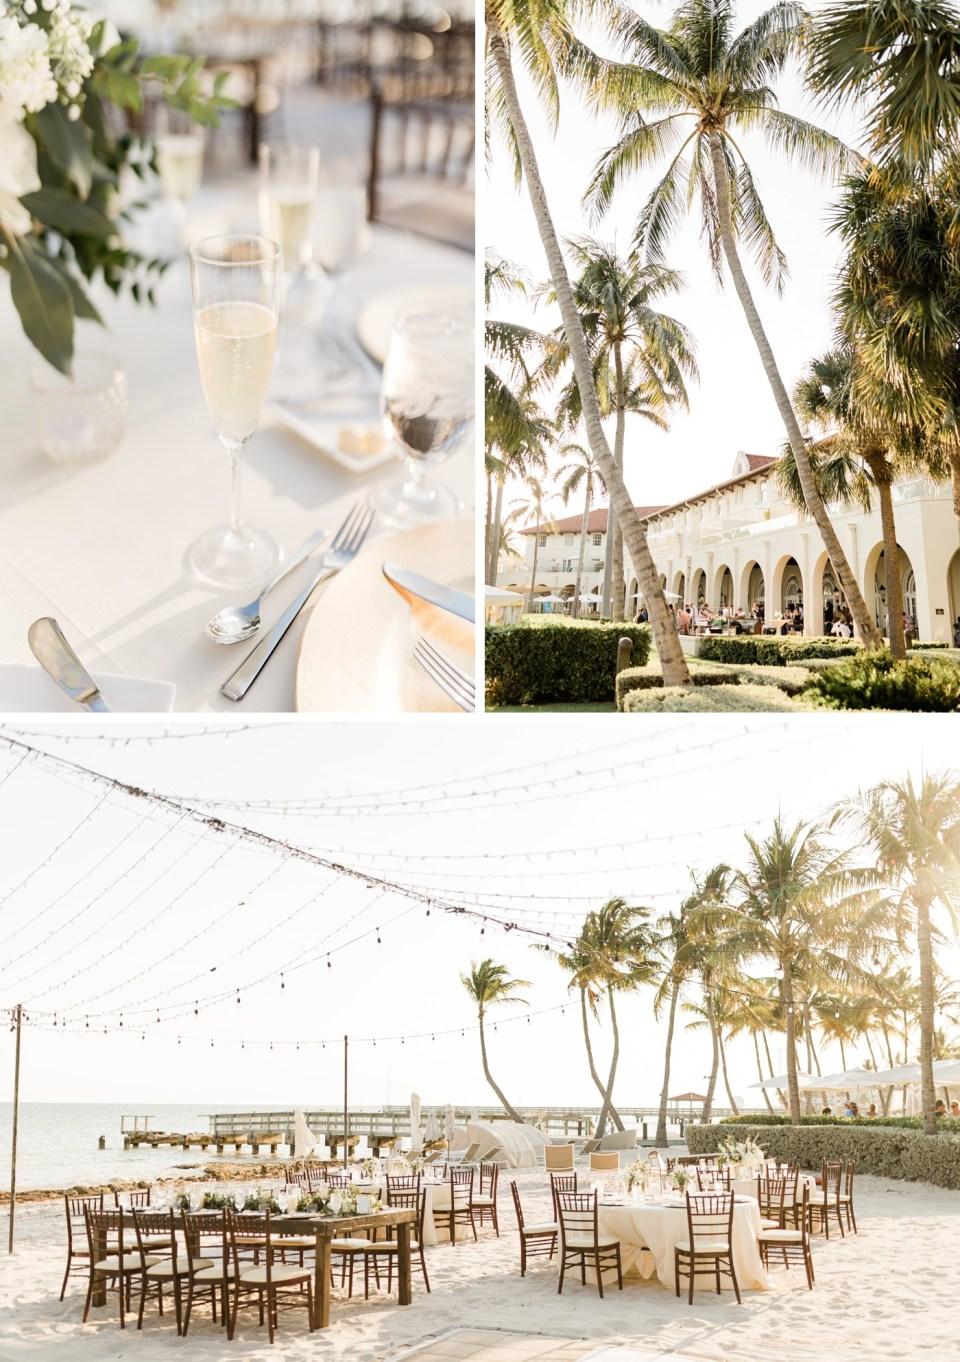 Beach wedding reception at Waldorf Casa Marina Resort